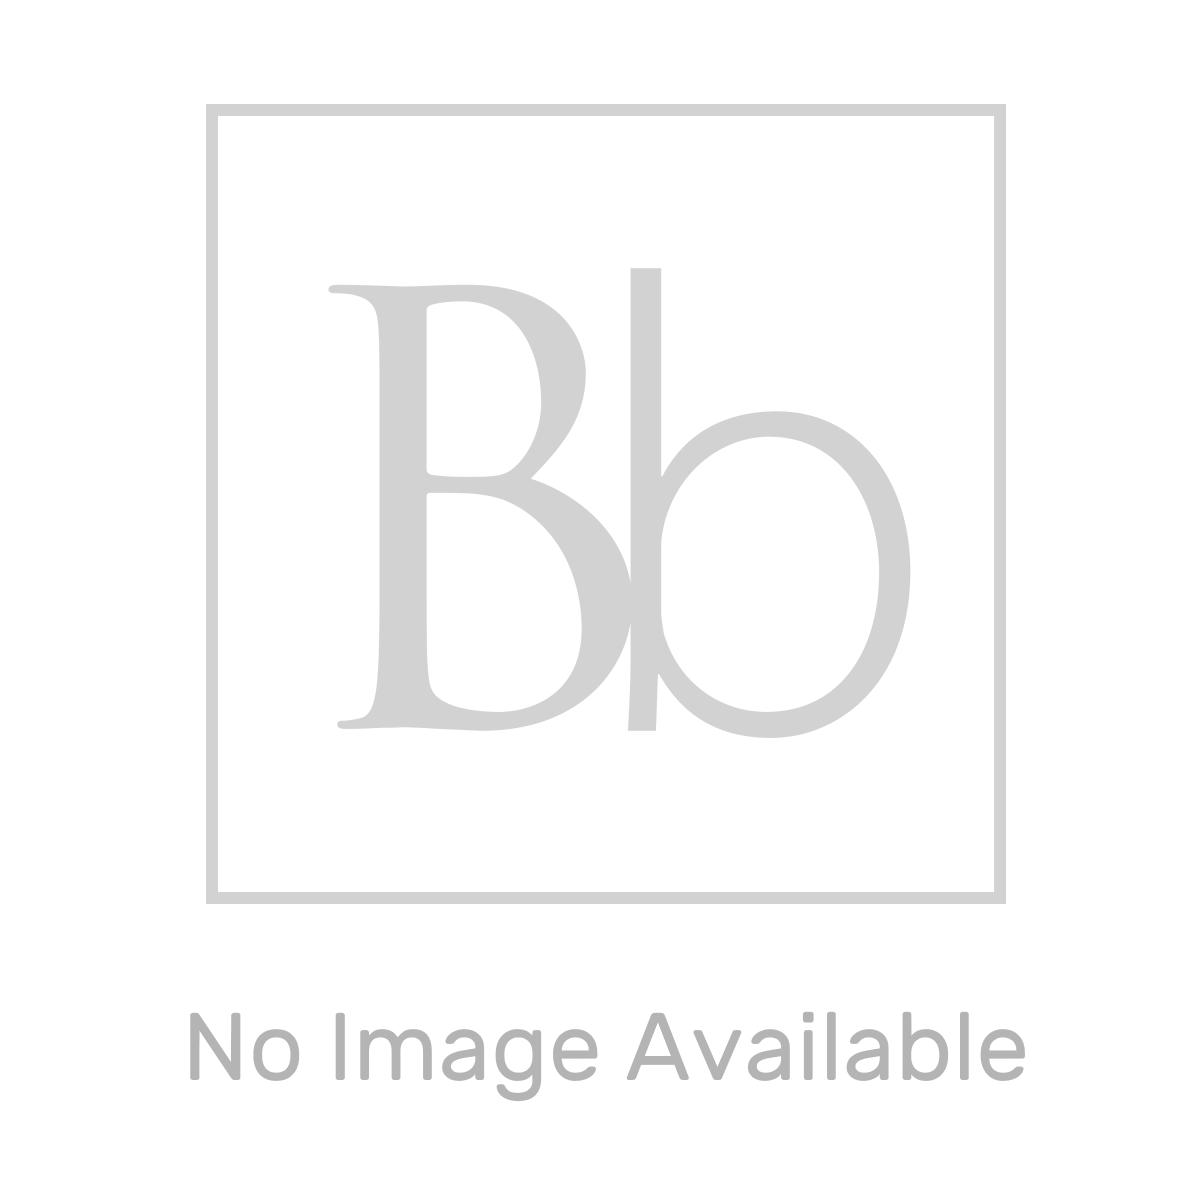 RAK Surface Dark Greige Rustic Tile 600 x 600mm